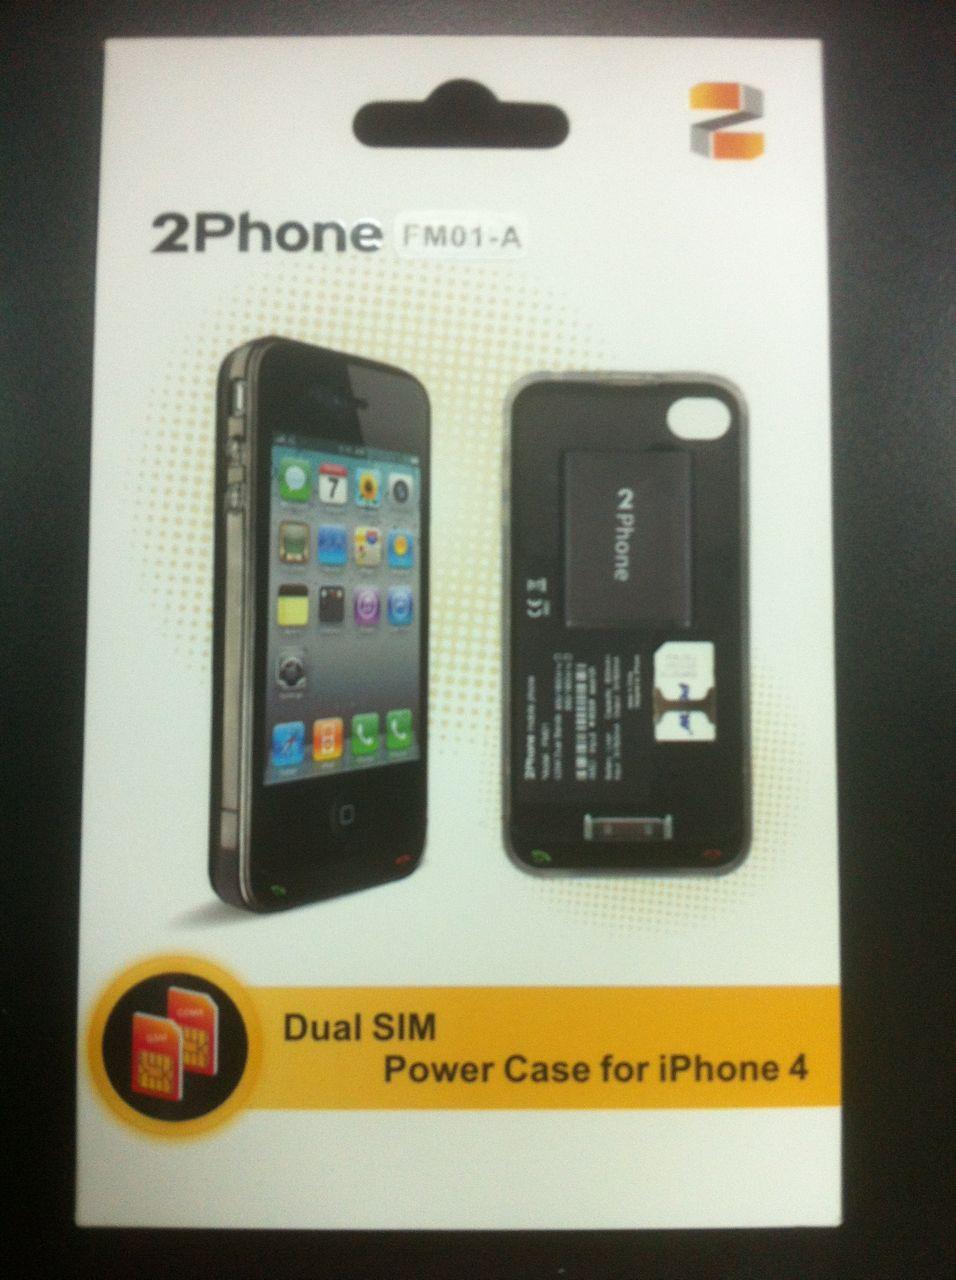 画像3: 2Phone